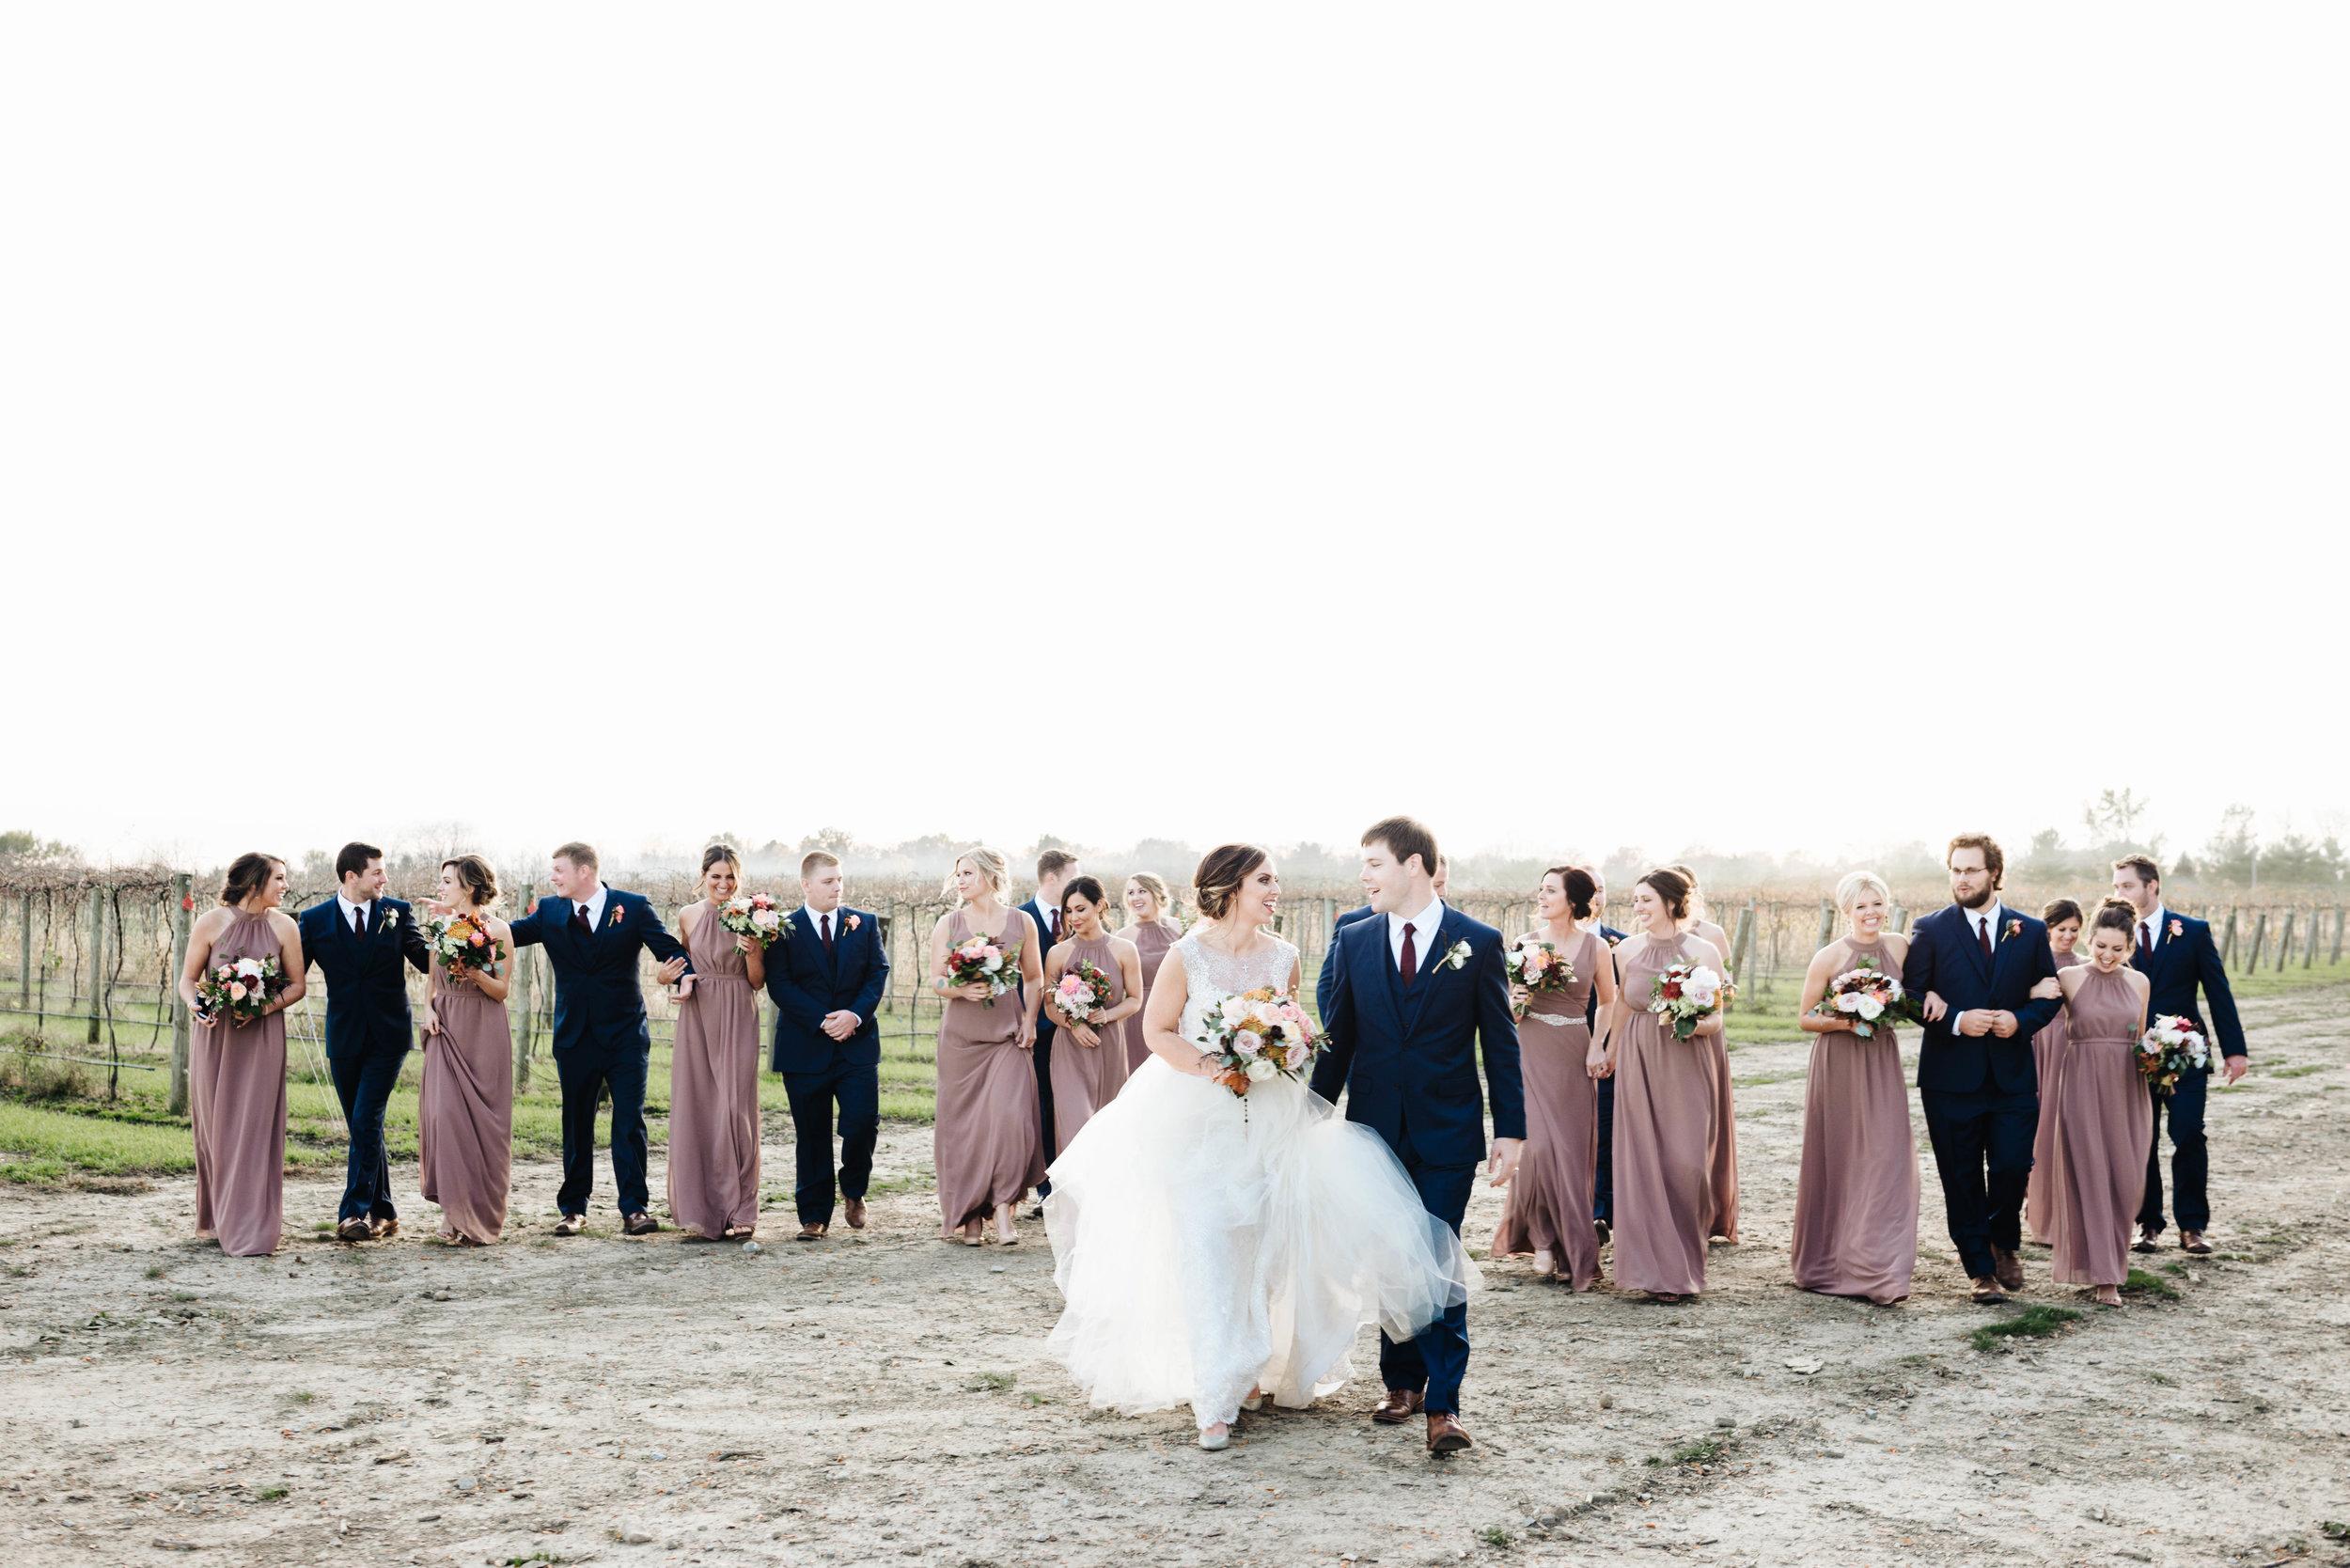 Carlee-Bob-Indianapolis-Wedding-Blog-77.jpg